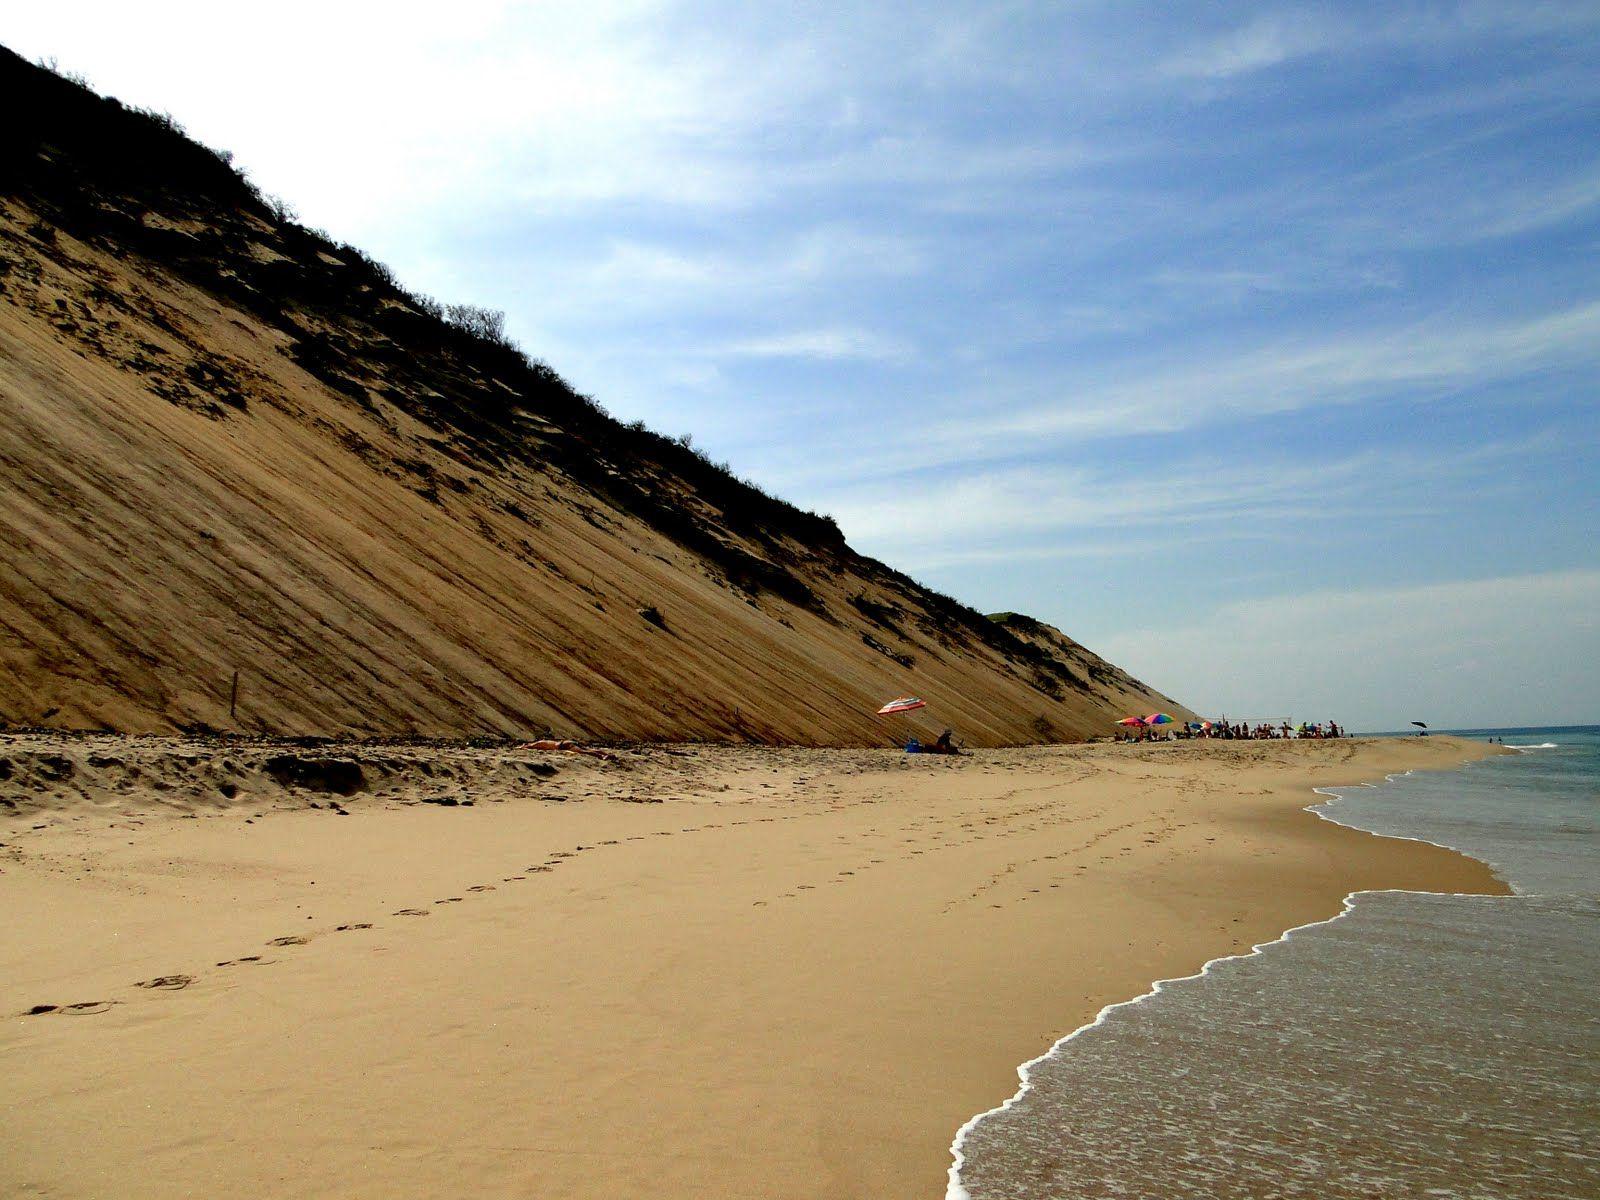 Longnook Beach Truro Ma My Favorite In The World